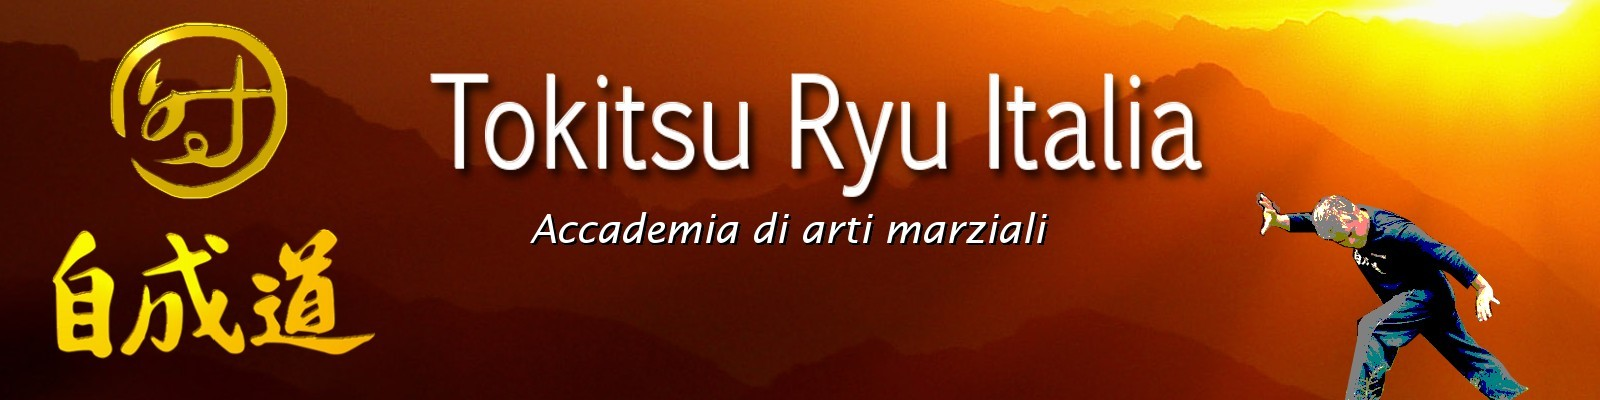 Dojo Vercelli - Tokitsu Ryu Italia